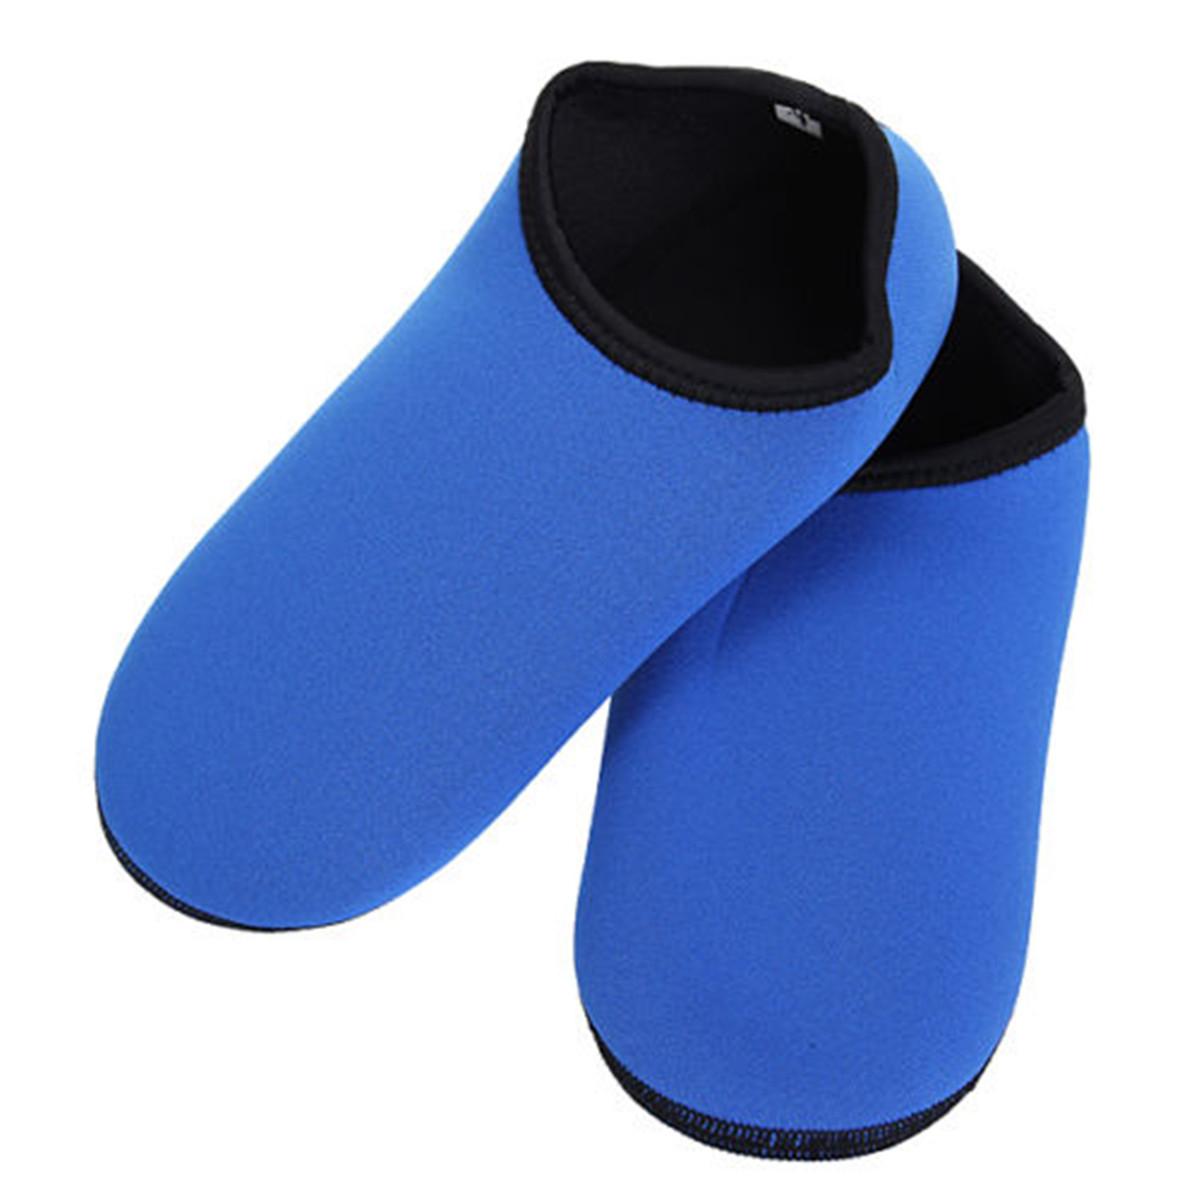 5 Size New 2.5mm 1 Pair Neoprene Diving Socks Swimming Diving Scuba Snorkeling Sports Socks Indoor Footwear Skiing Gadgets(China (Mainland))